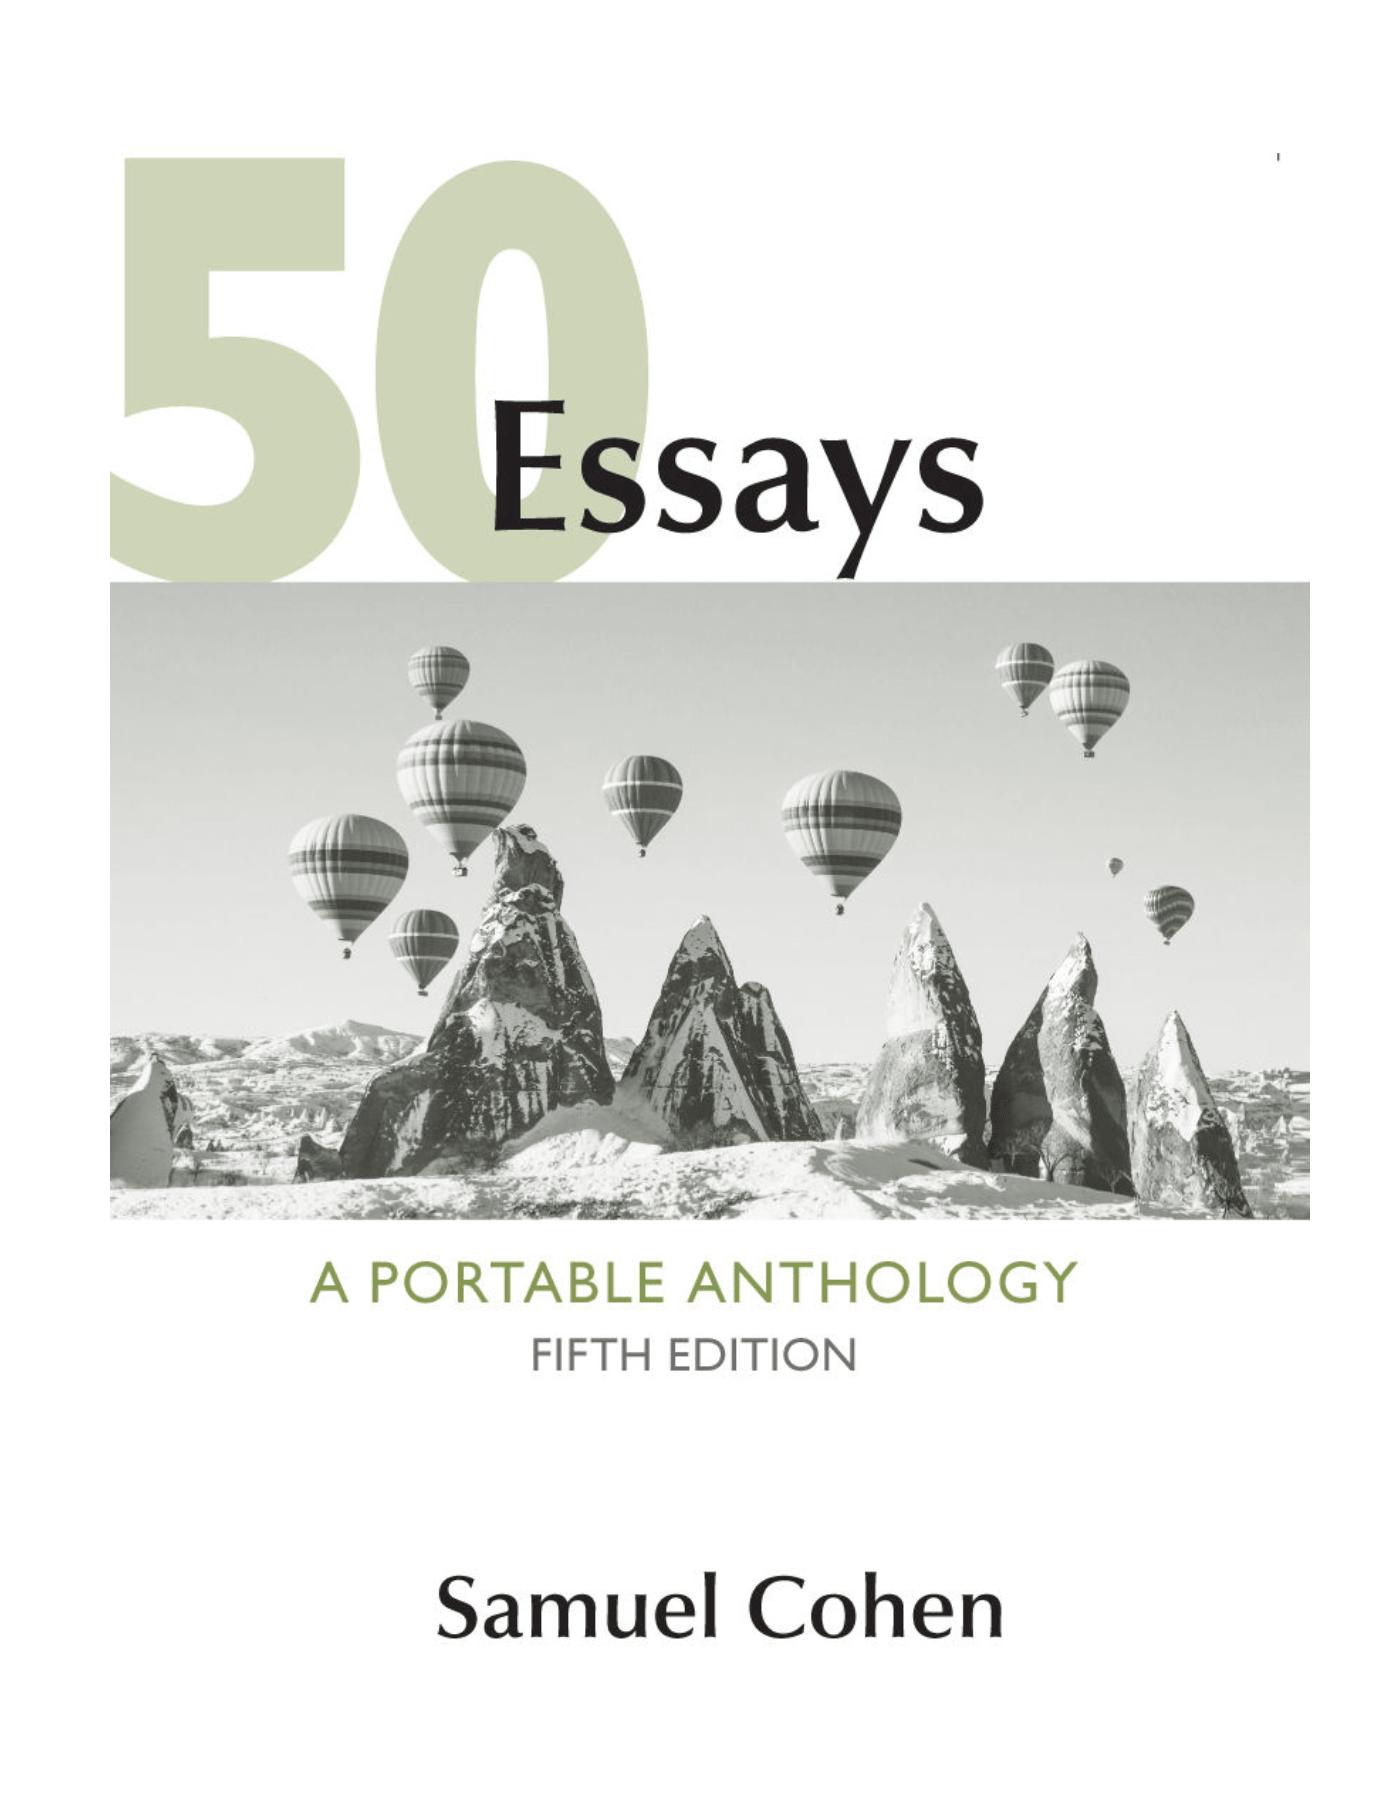 006 50fit14002c1800ssl1 Essays Portable Anthology 5th Edition Pdf Essay Fascinating 50 A Full